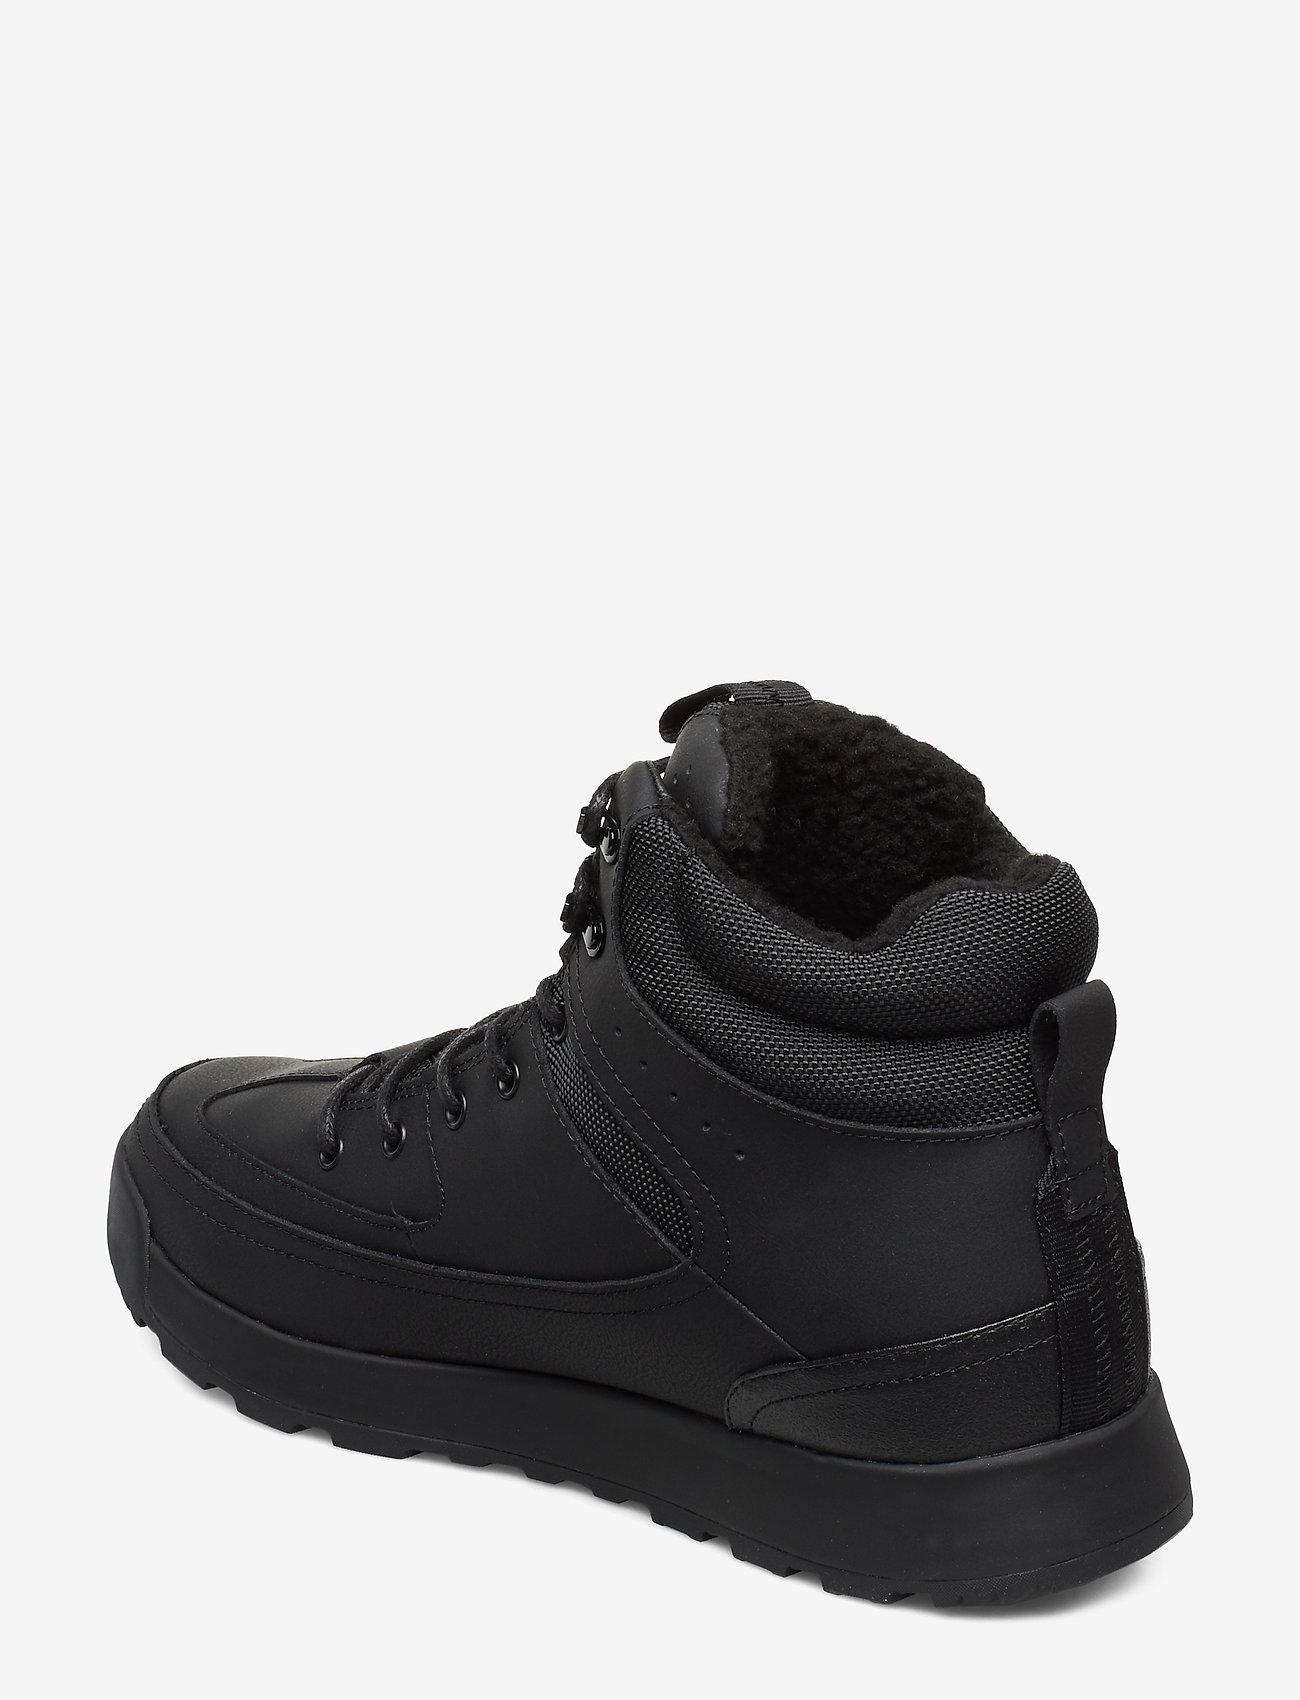 Urban Breaker4192cma (Blk/blk Lth Wr) - Lacoste Shoes